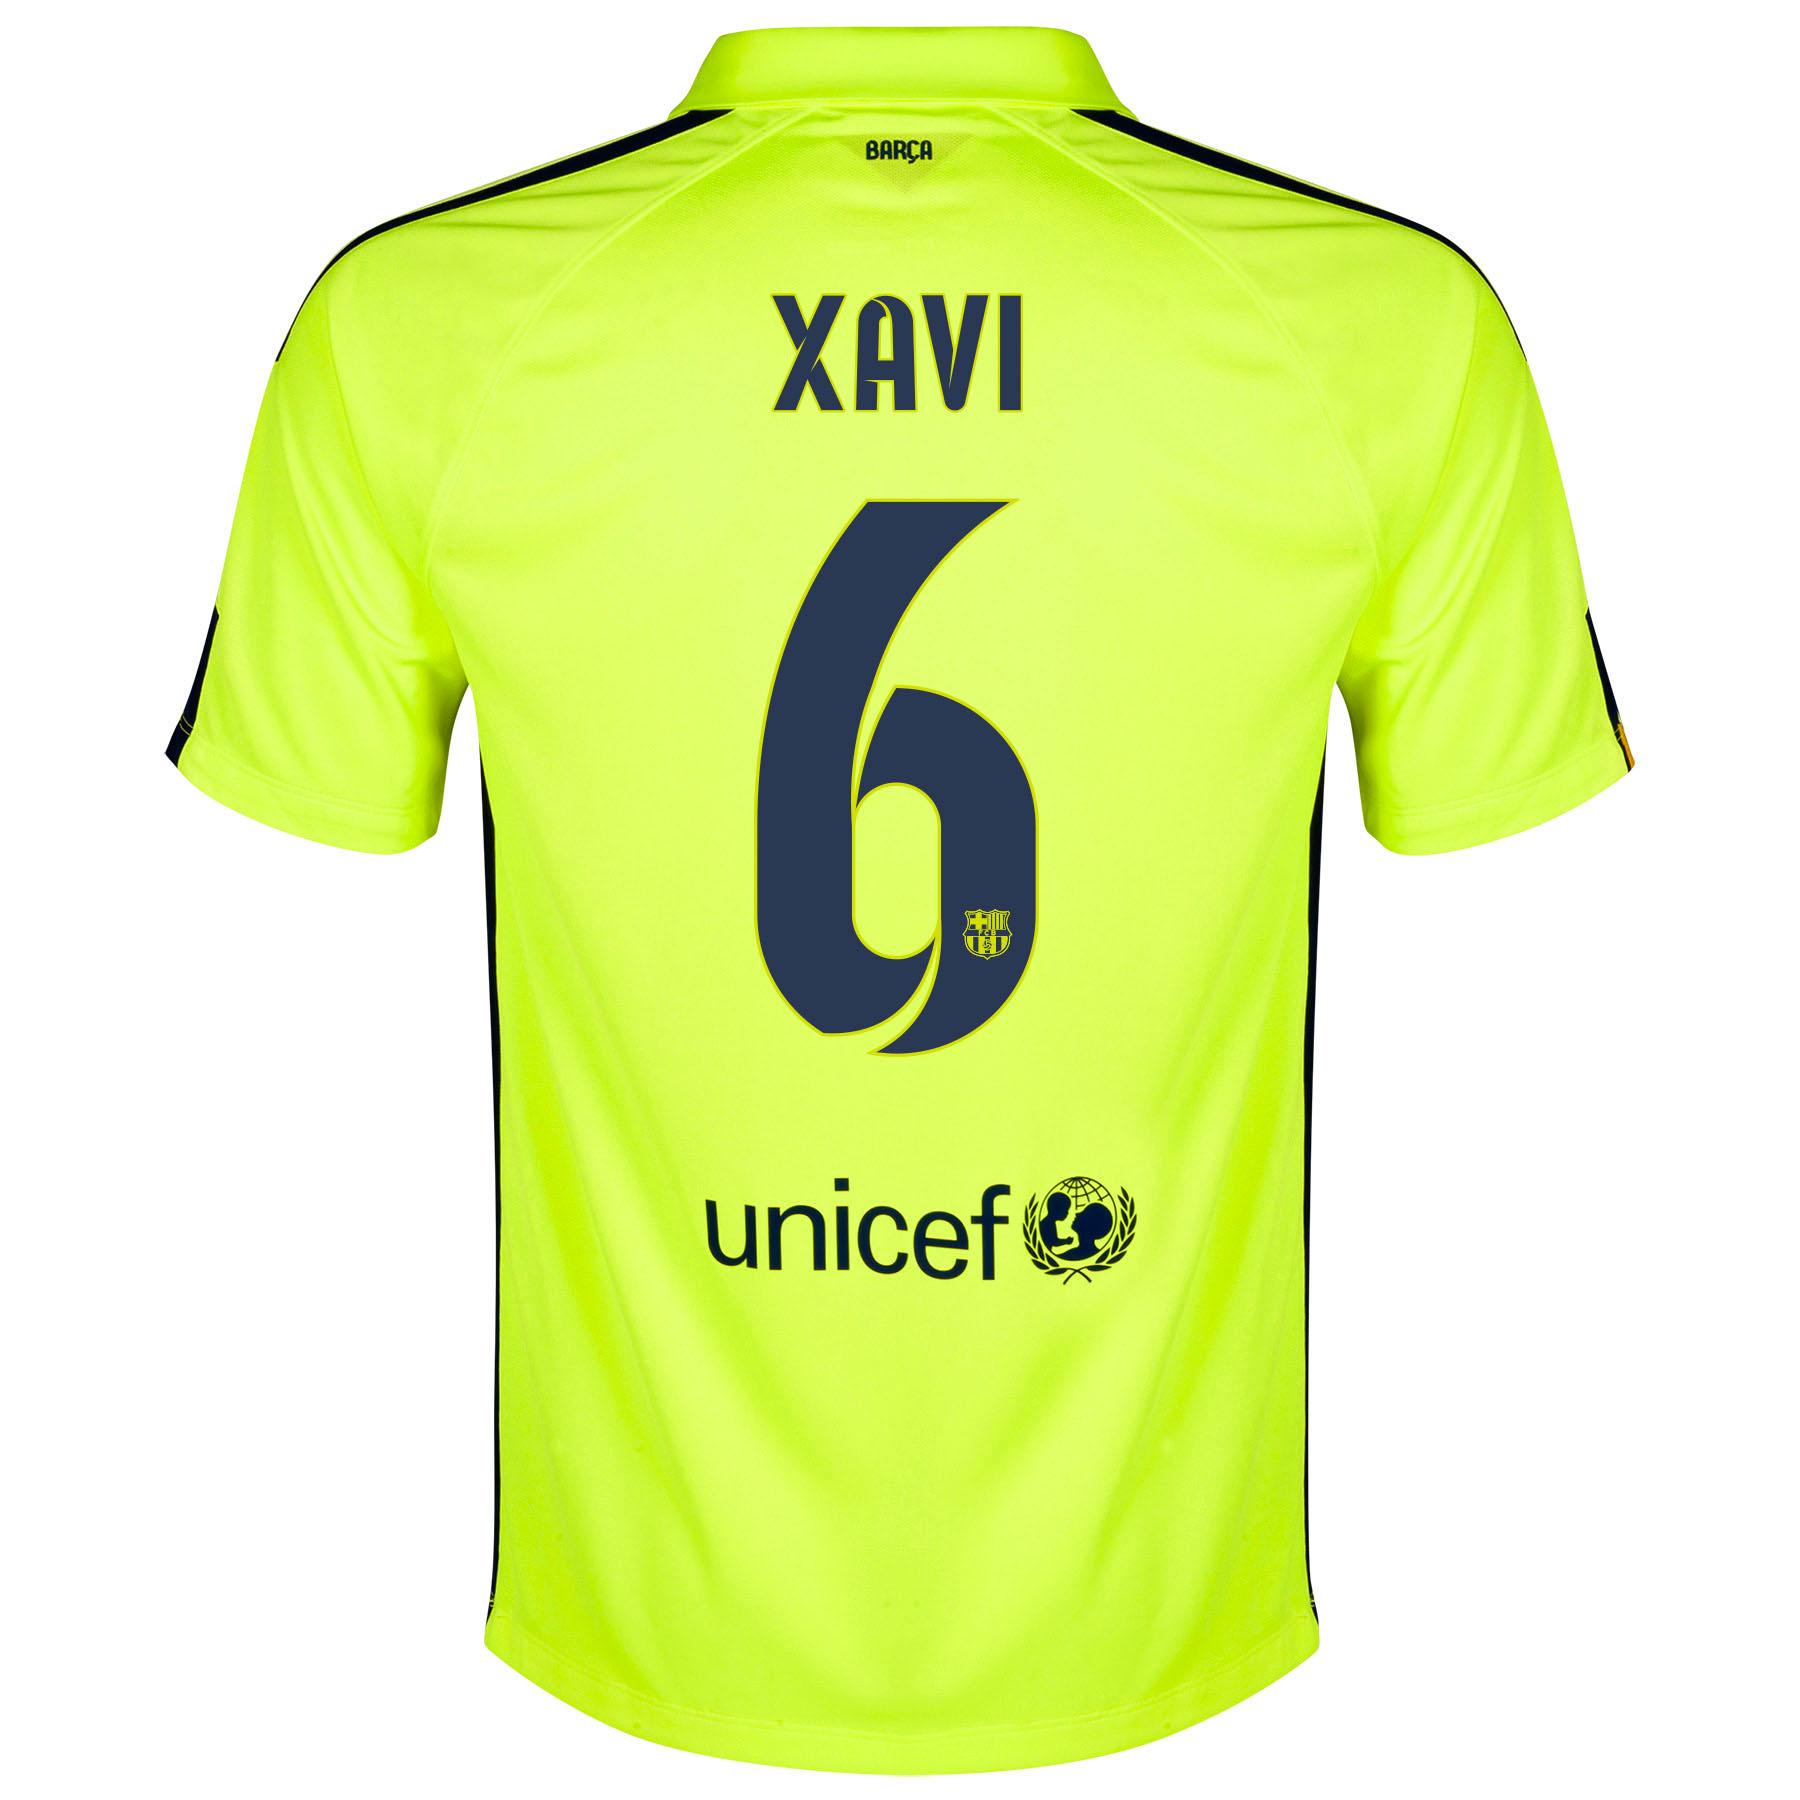 Barcelona Third Shirt 2014/15 Yellow with Xavi 6 printing